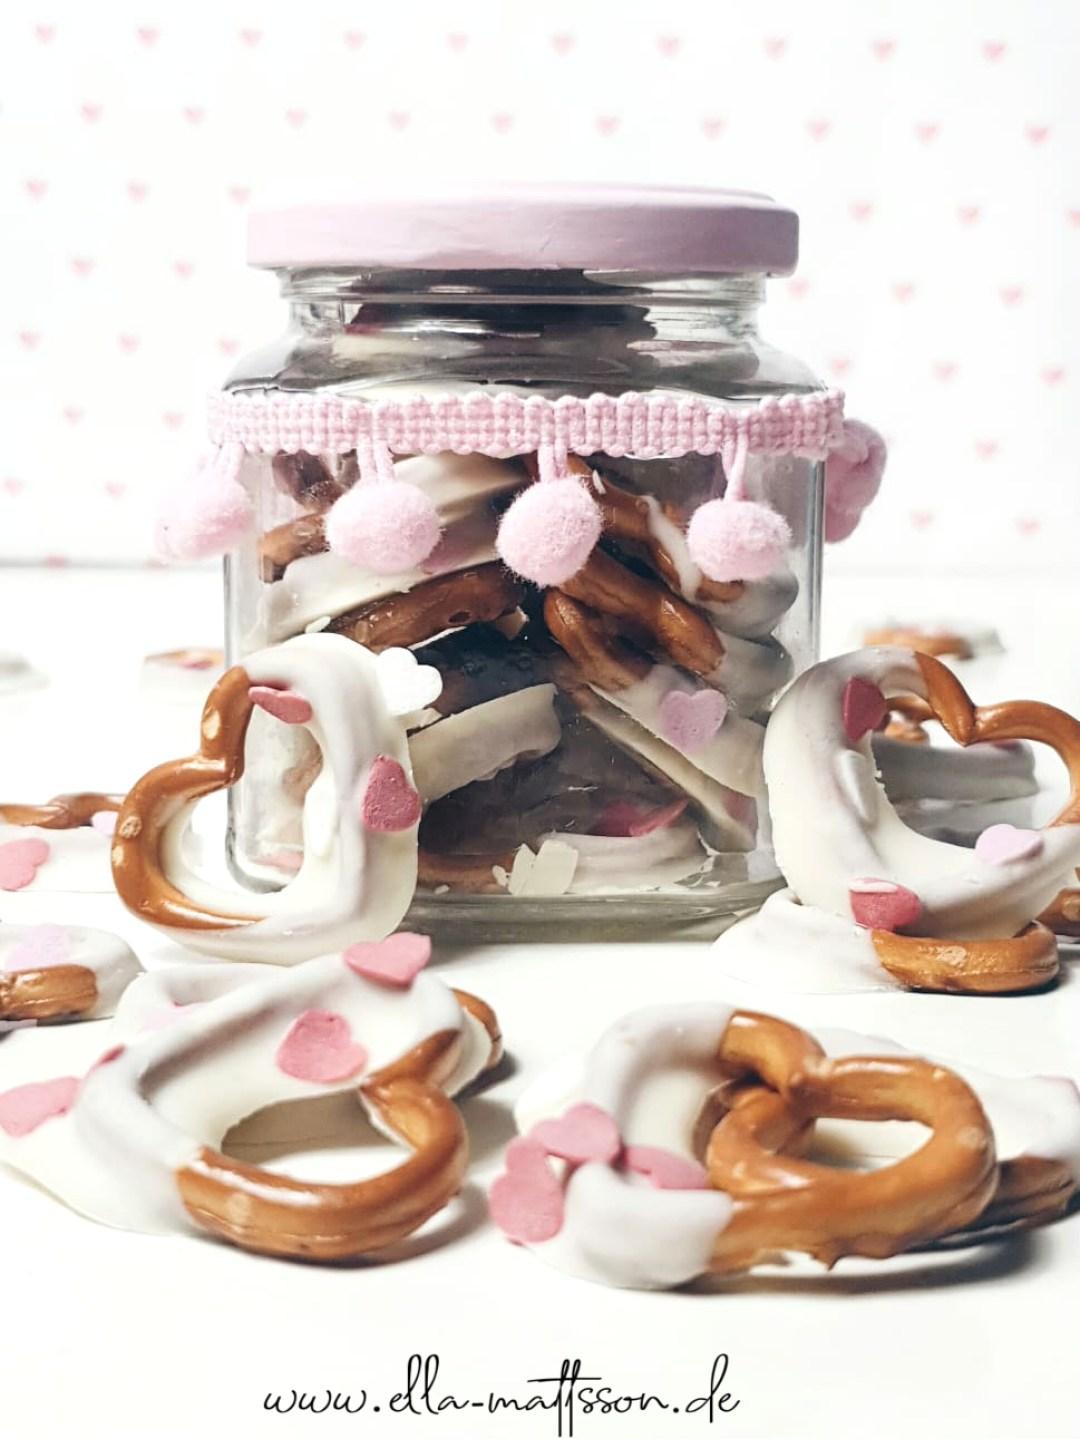 Valentinstag Brezel diy basteln snack rezept geschenkidee selbermachen